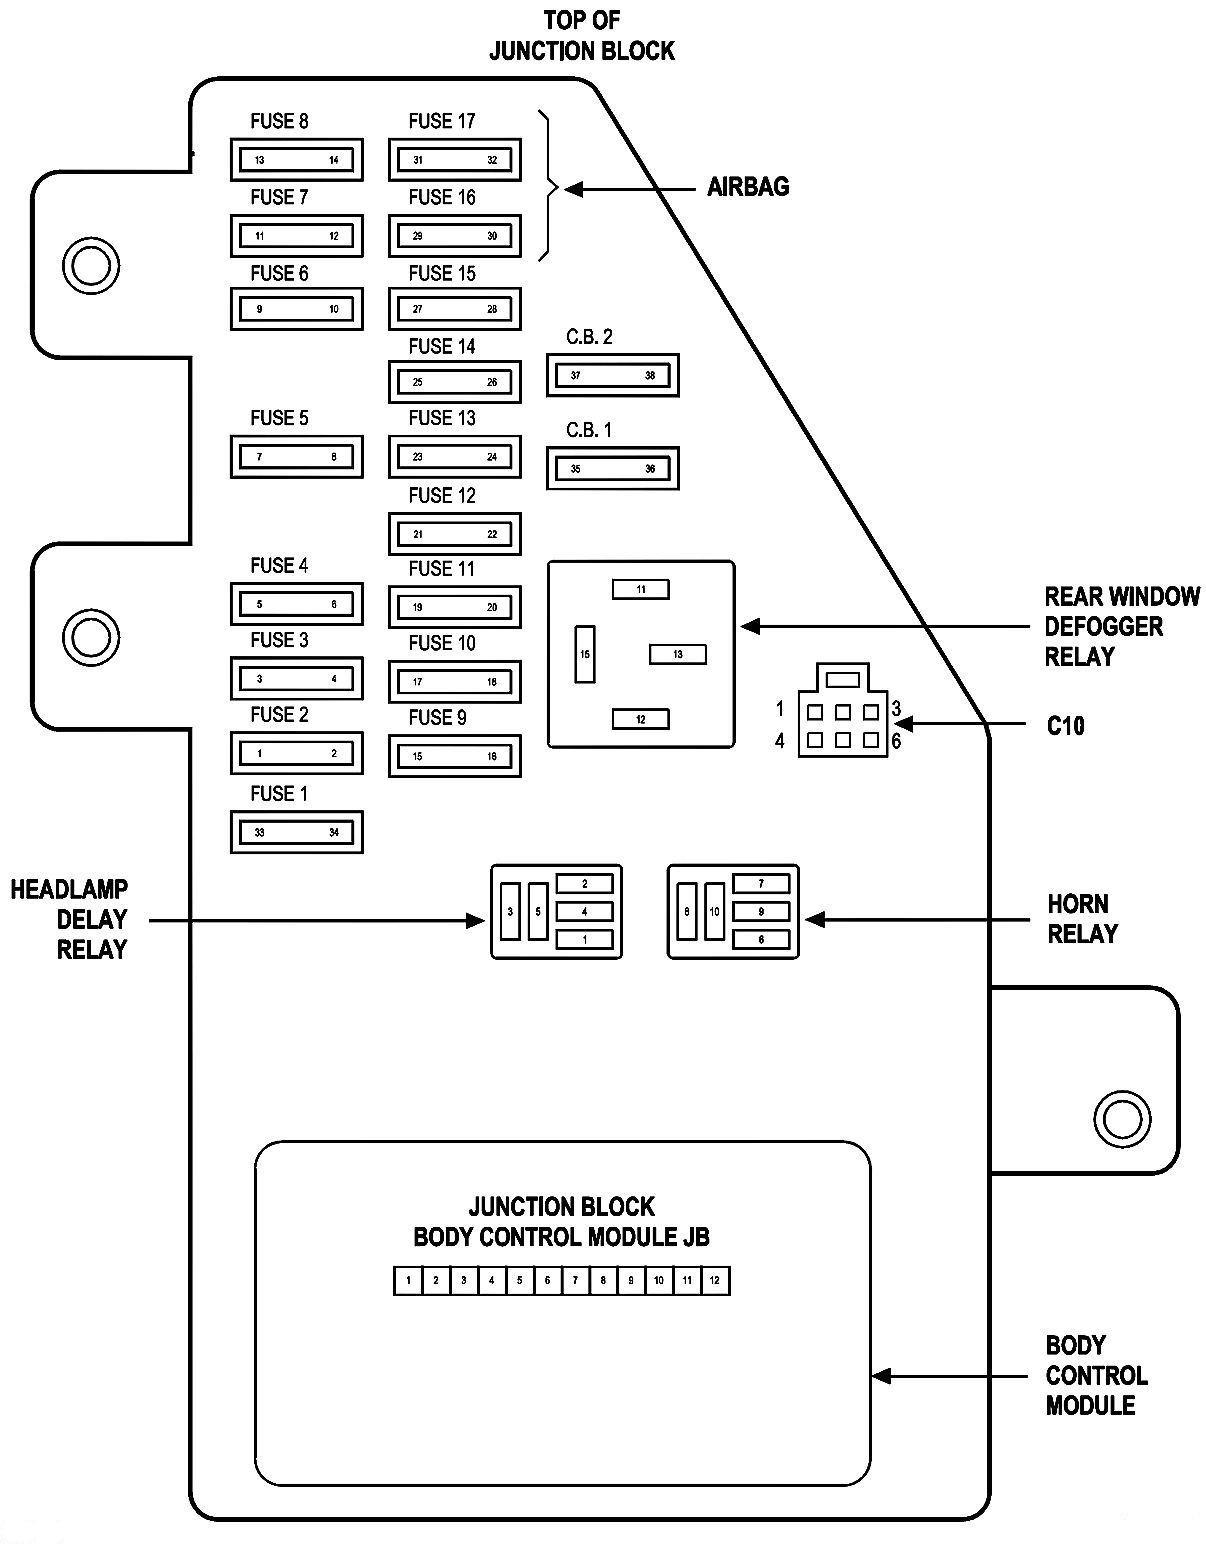 2002 Sebring Engine Diagram Dayton Pendant Wiring Diagram Toyota Tps Losdol2 Jeanjaures37 Fr